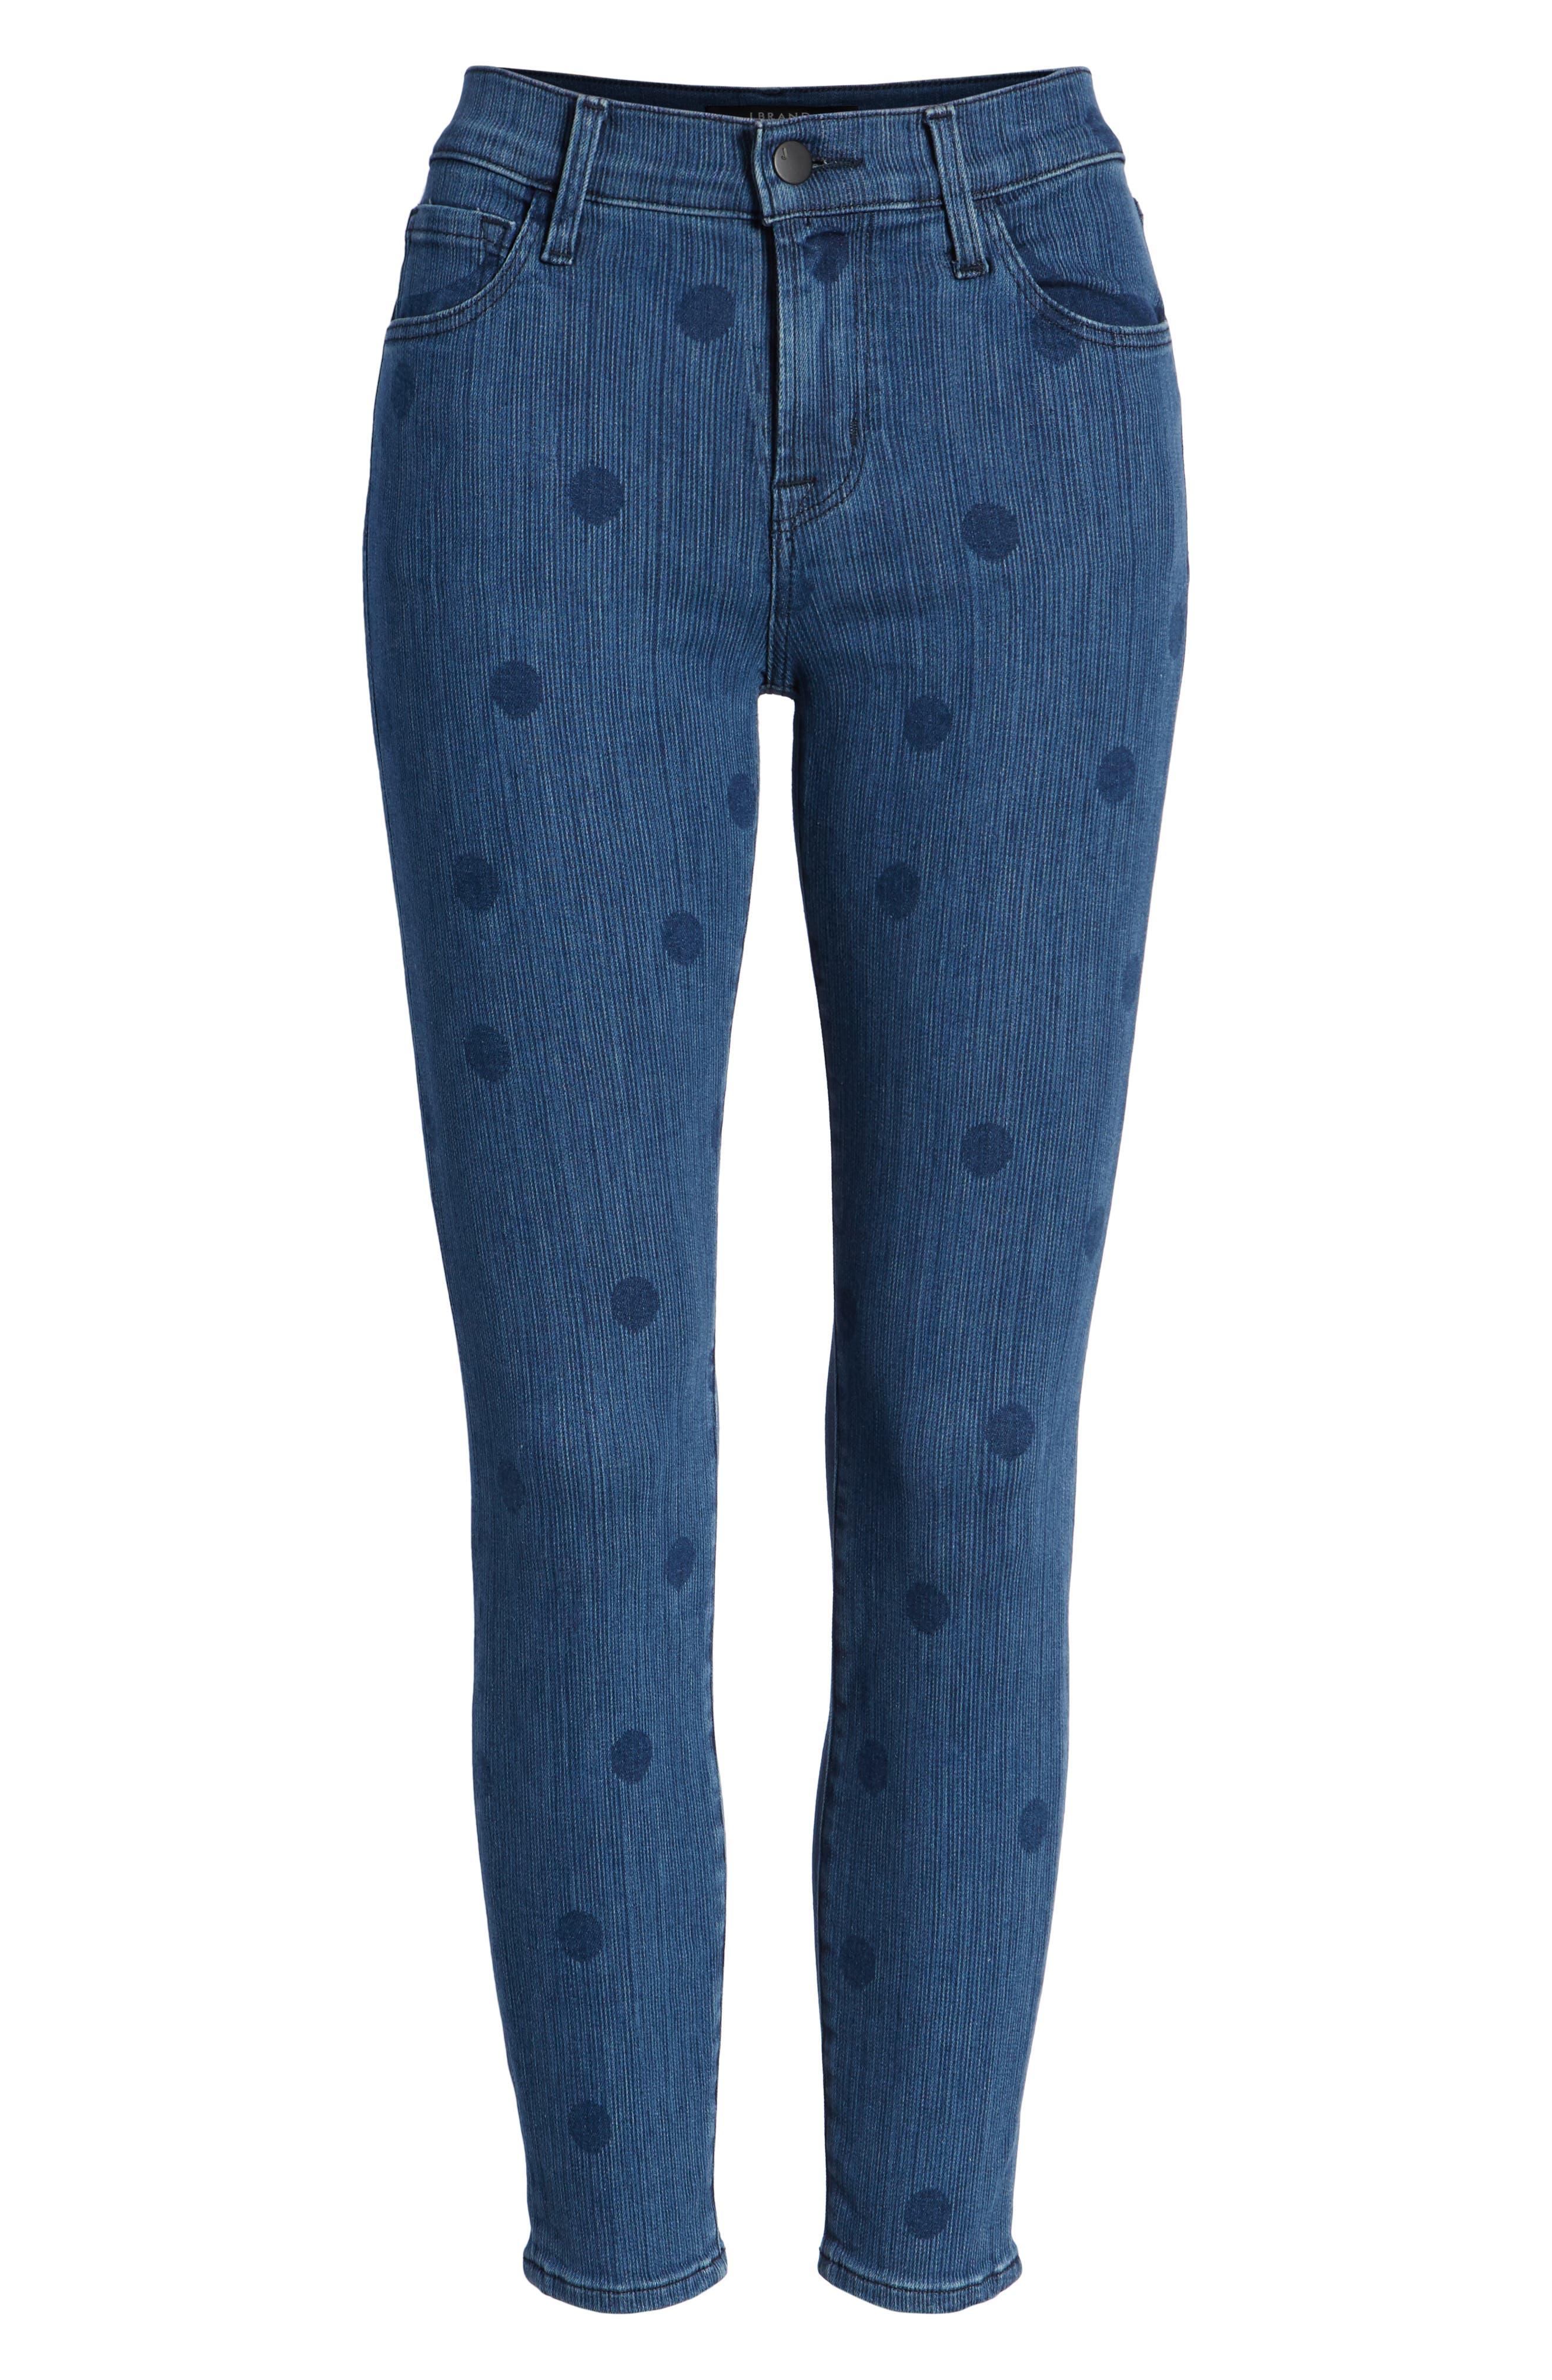 835 Capri Skinny Jeans,                             Alternate thumbnail 7, color,                             Aerial